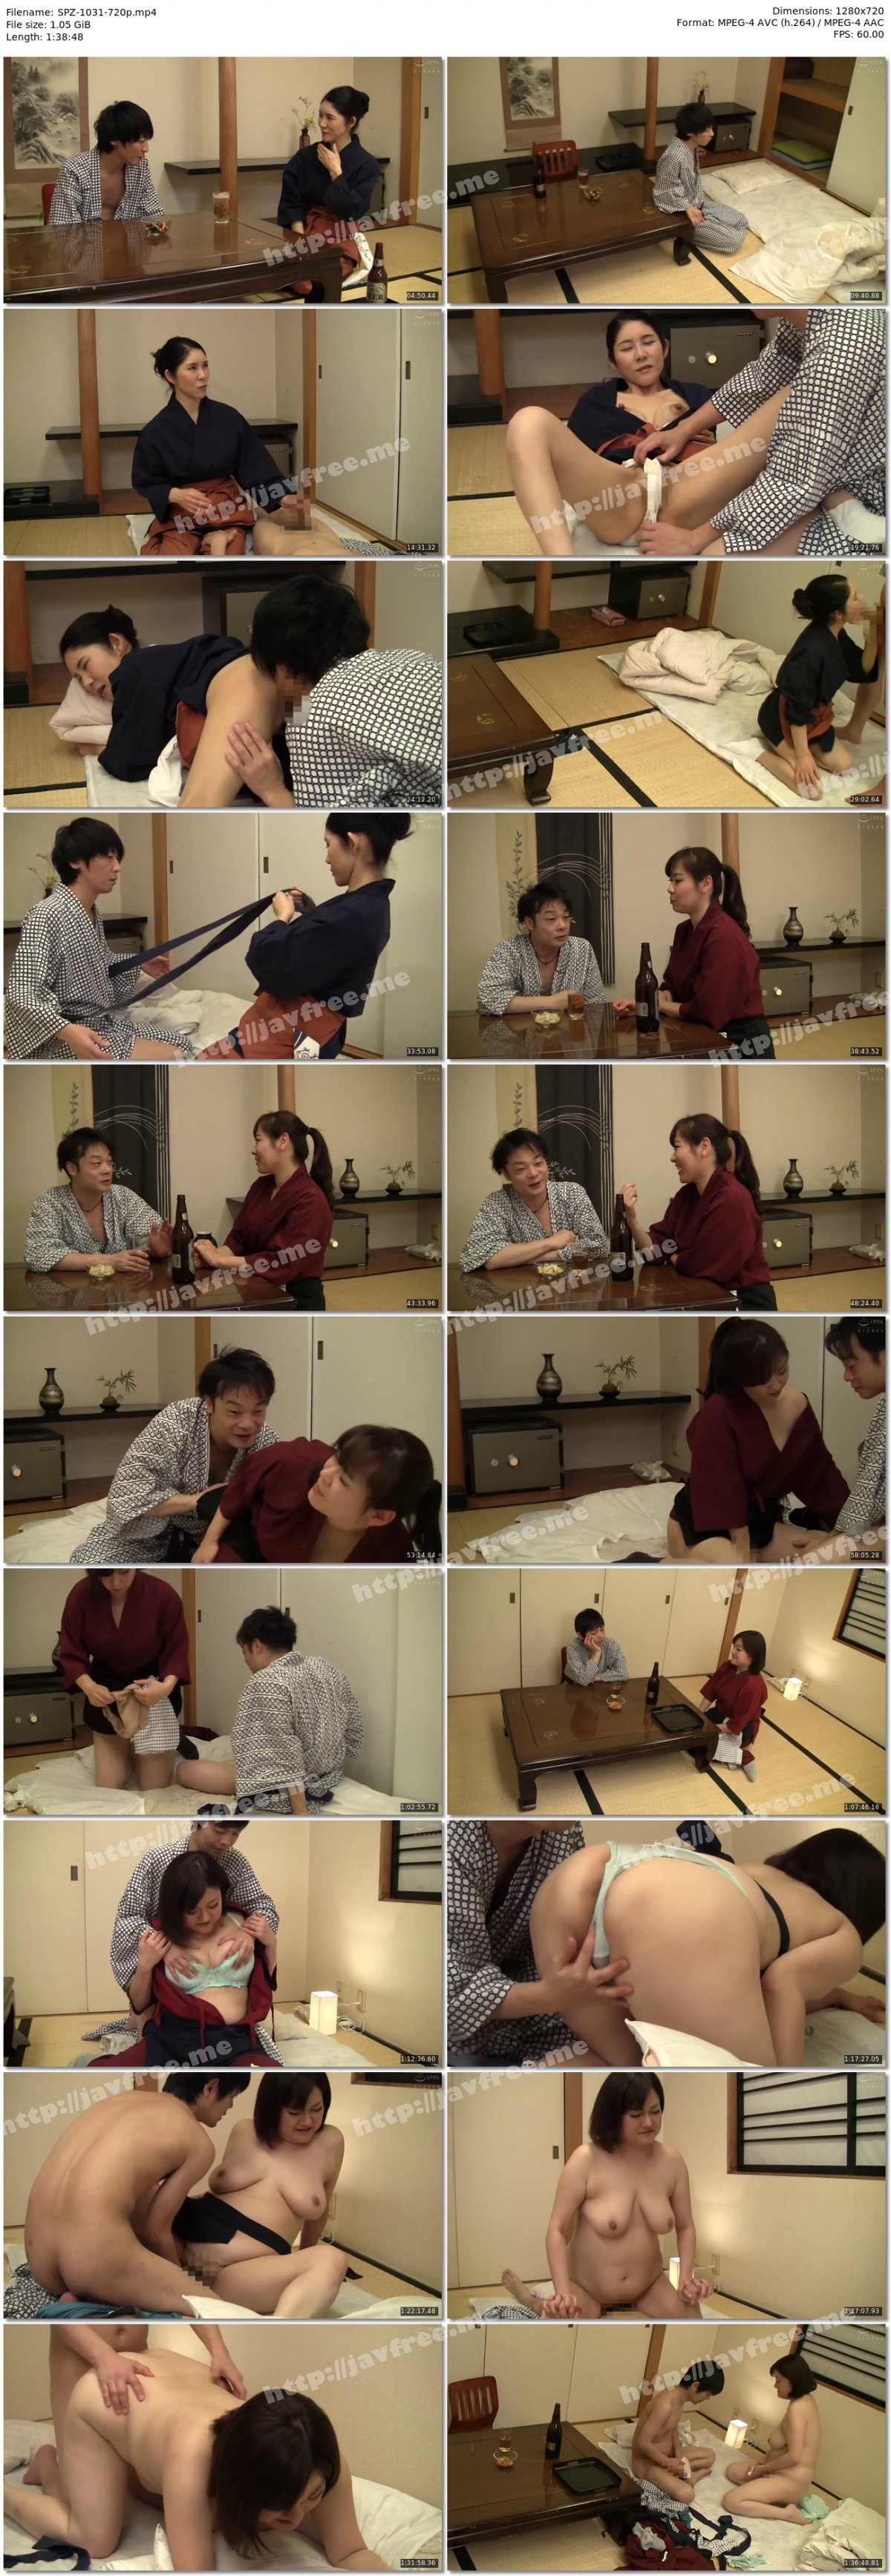 [HD][SPZ-1031] 意外とヤレる!!地方旅館の仲居のおばさん - image SPZ-1031-720p on https://javfree.me